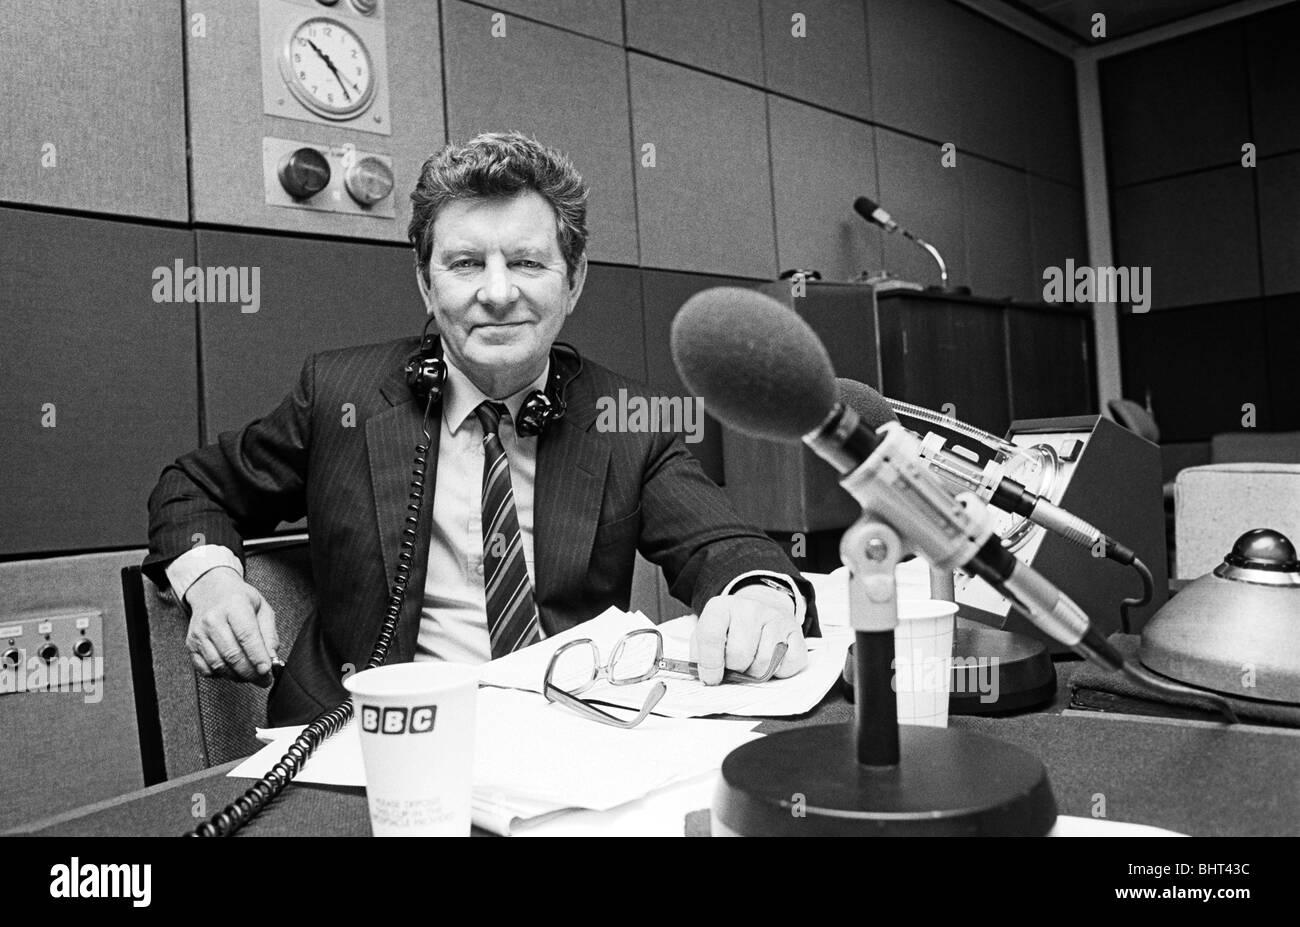 the-veteran-bbc-broadcaster-richard-bake